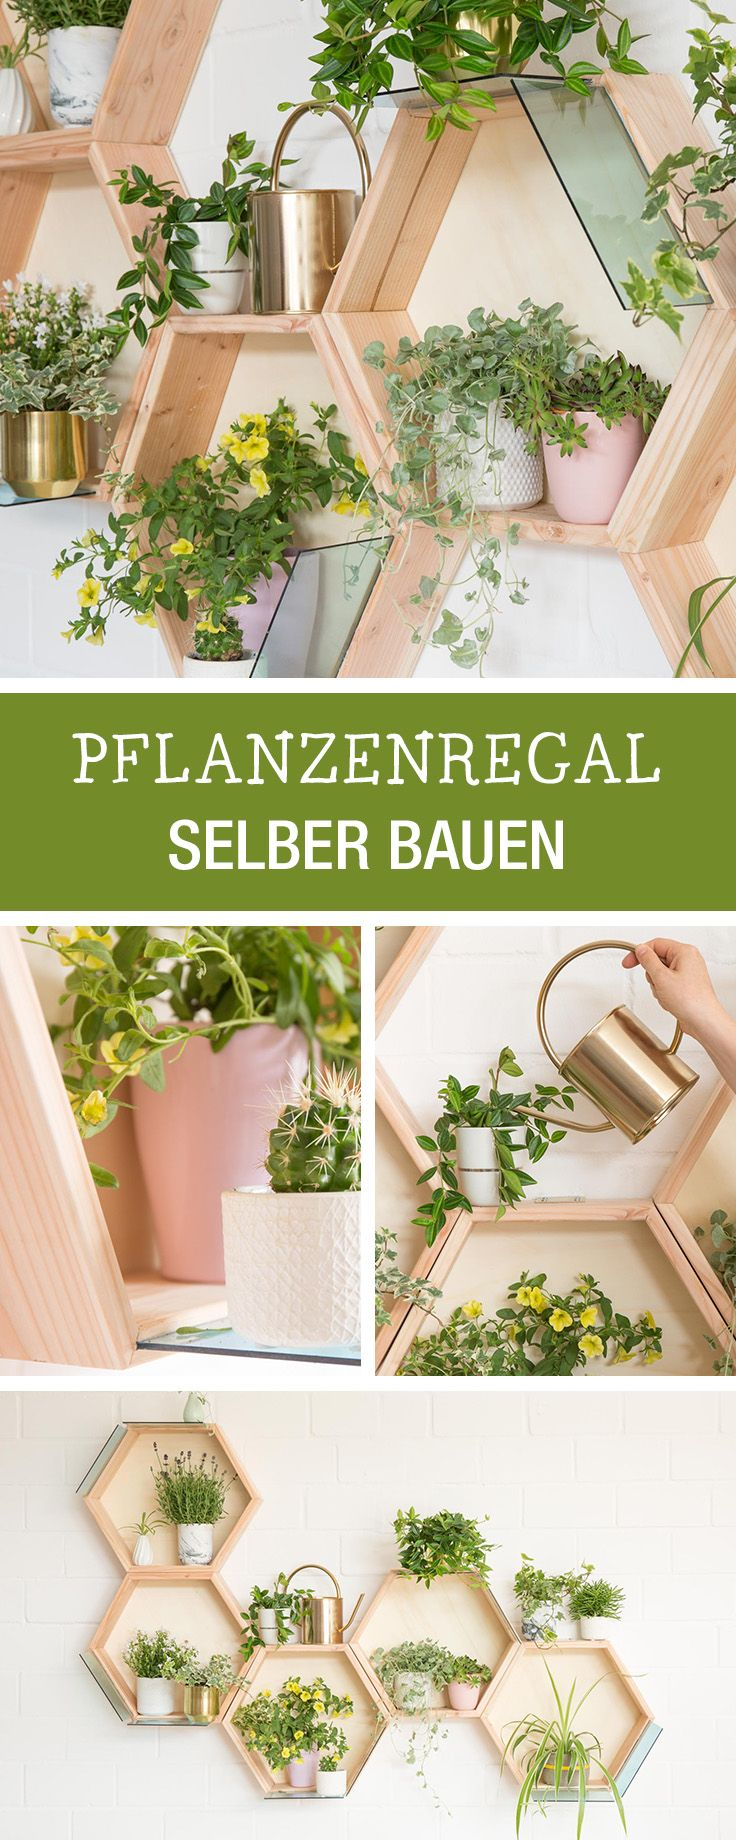 Diy Anleitung Dekoratives Pflanzenregal Selber Bauen Via Dawanda